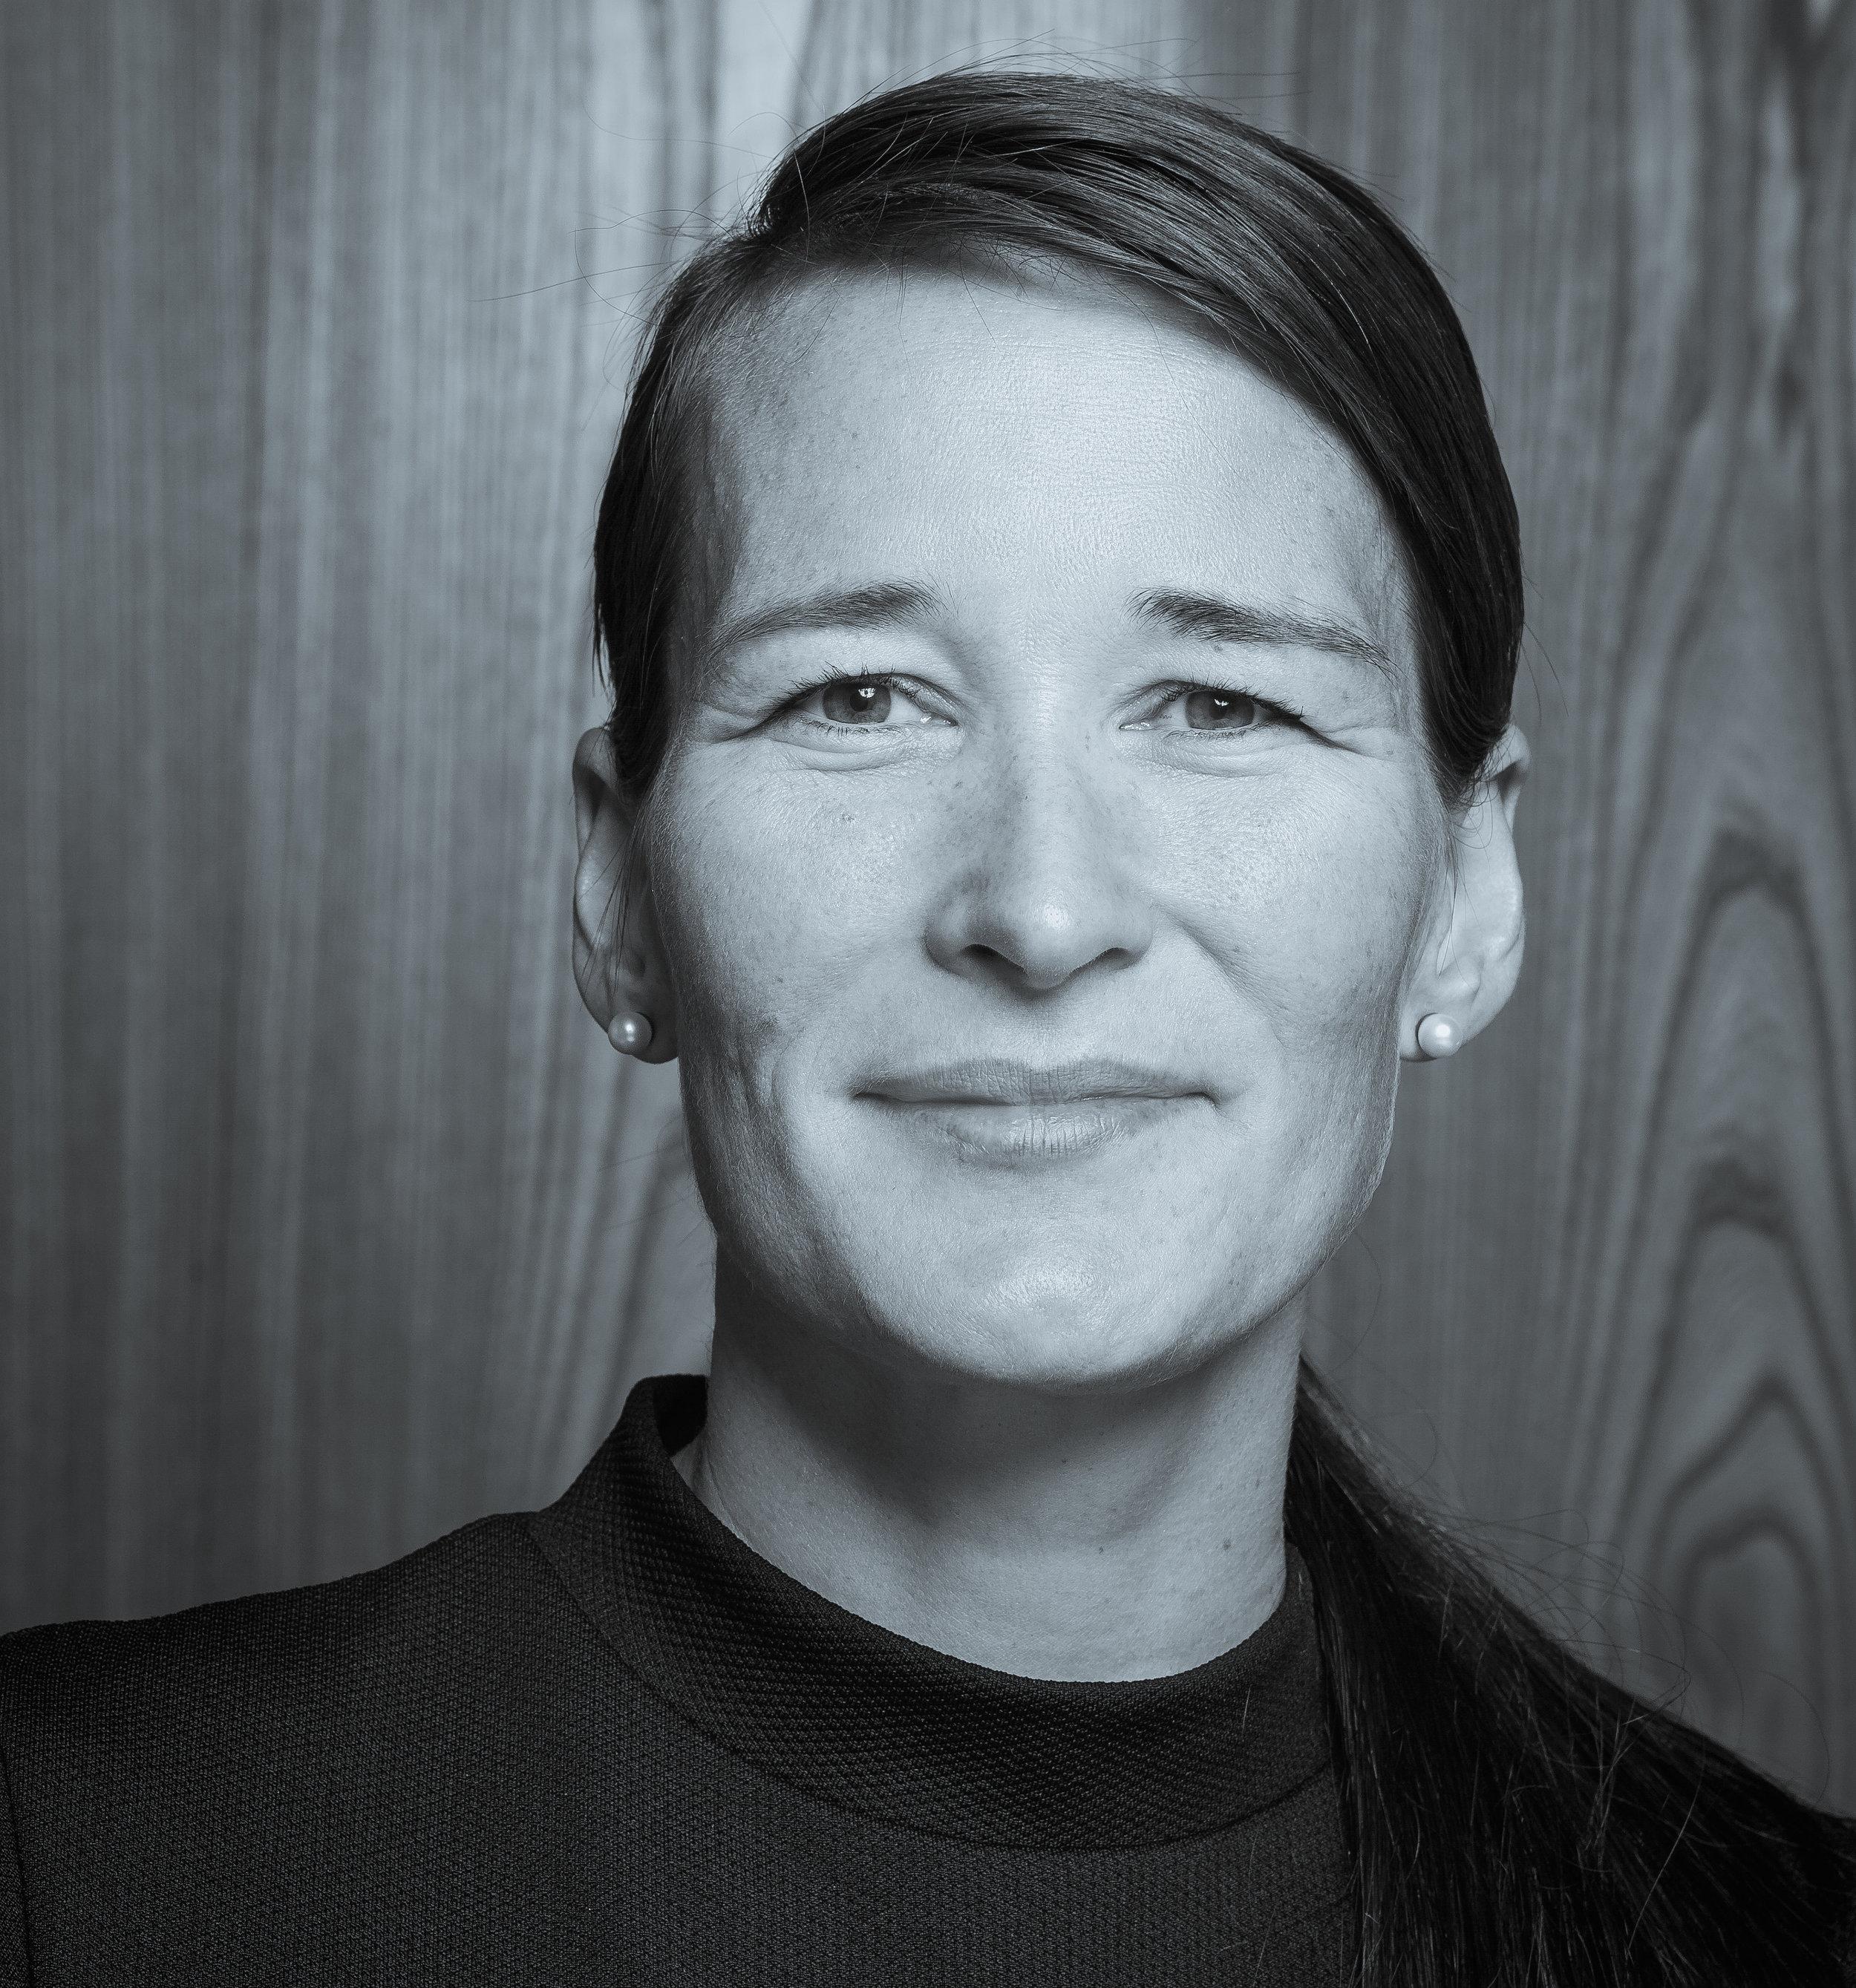 Inga Dora Markussen<br>Head of Education & Training at Royal Greenland. Former General Secretary of the West Nordic Council. ©Heida Helgadottir